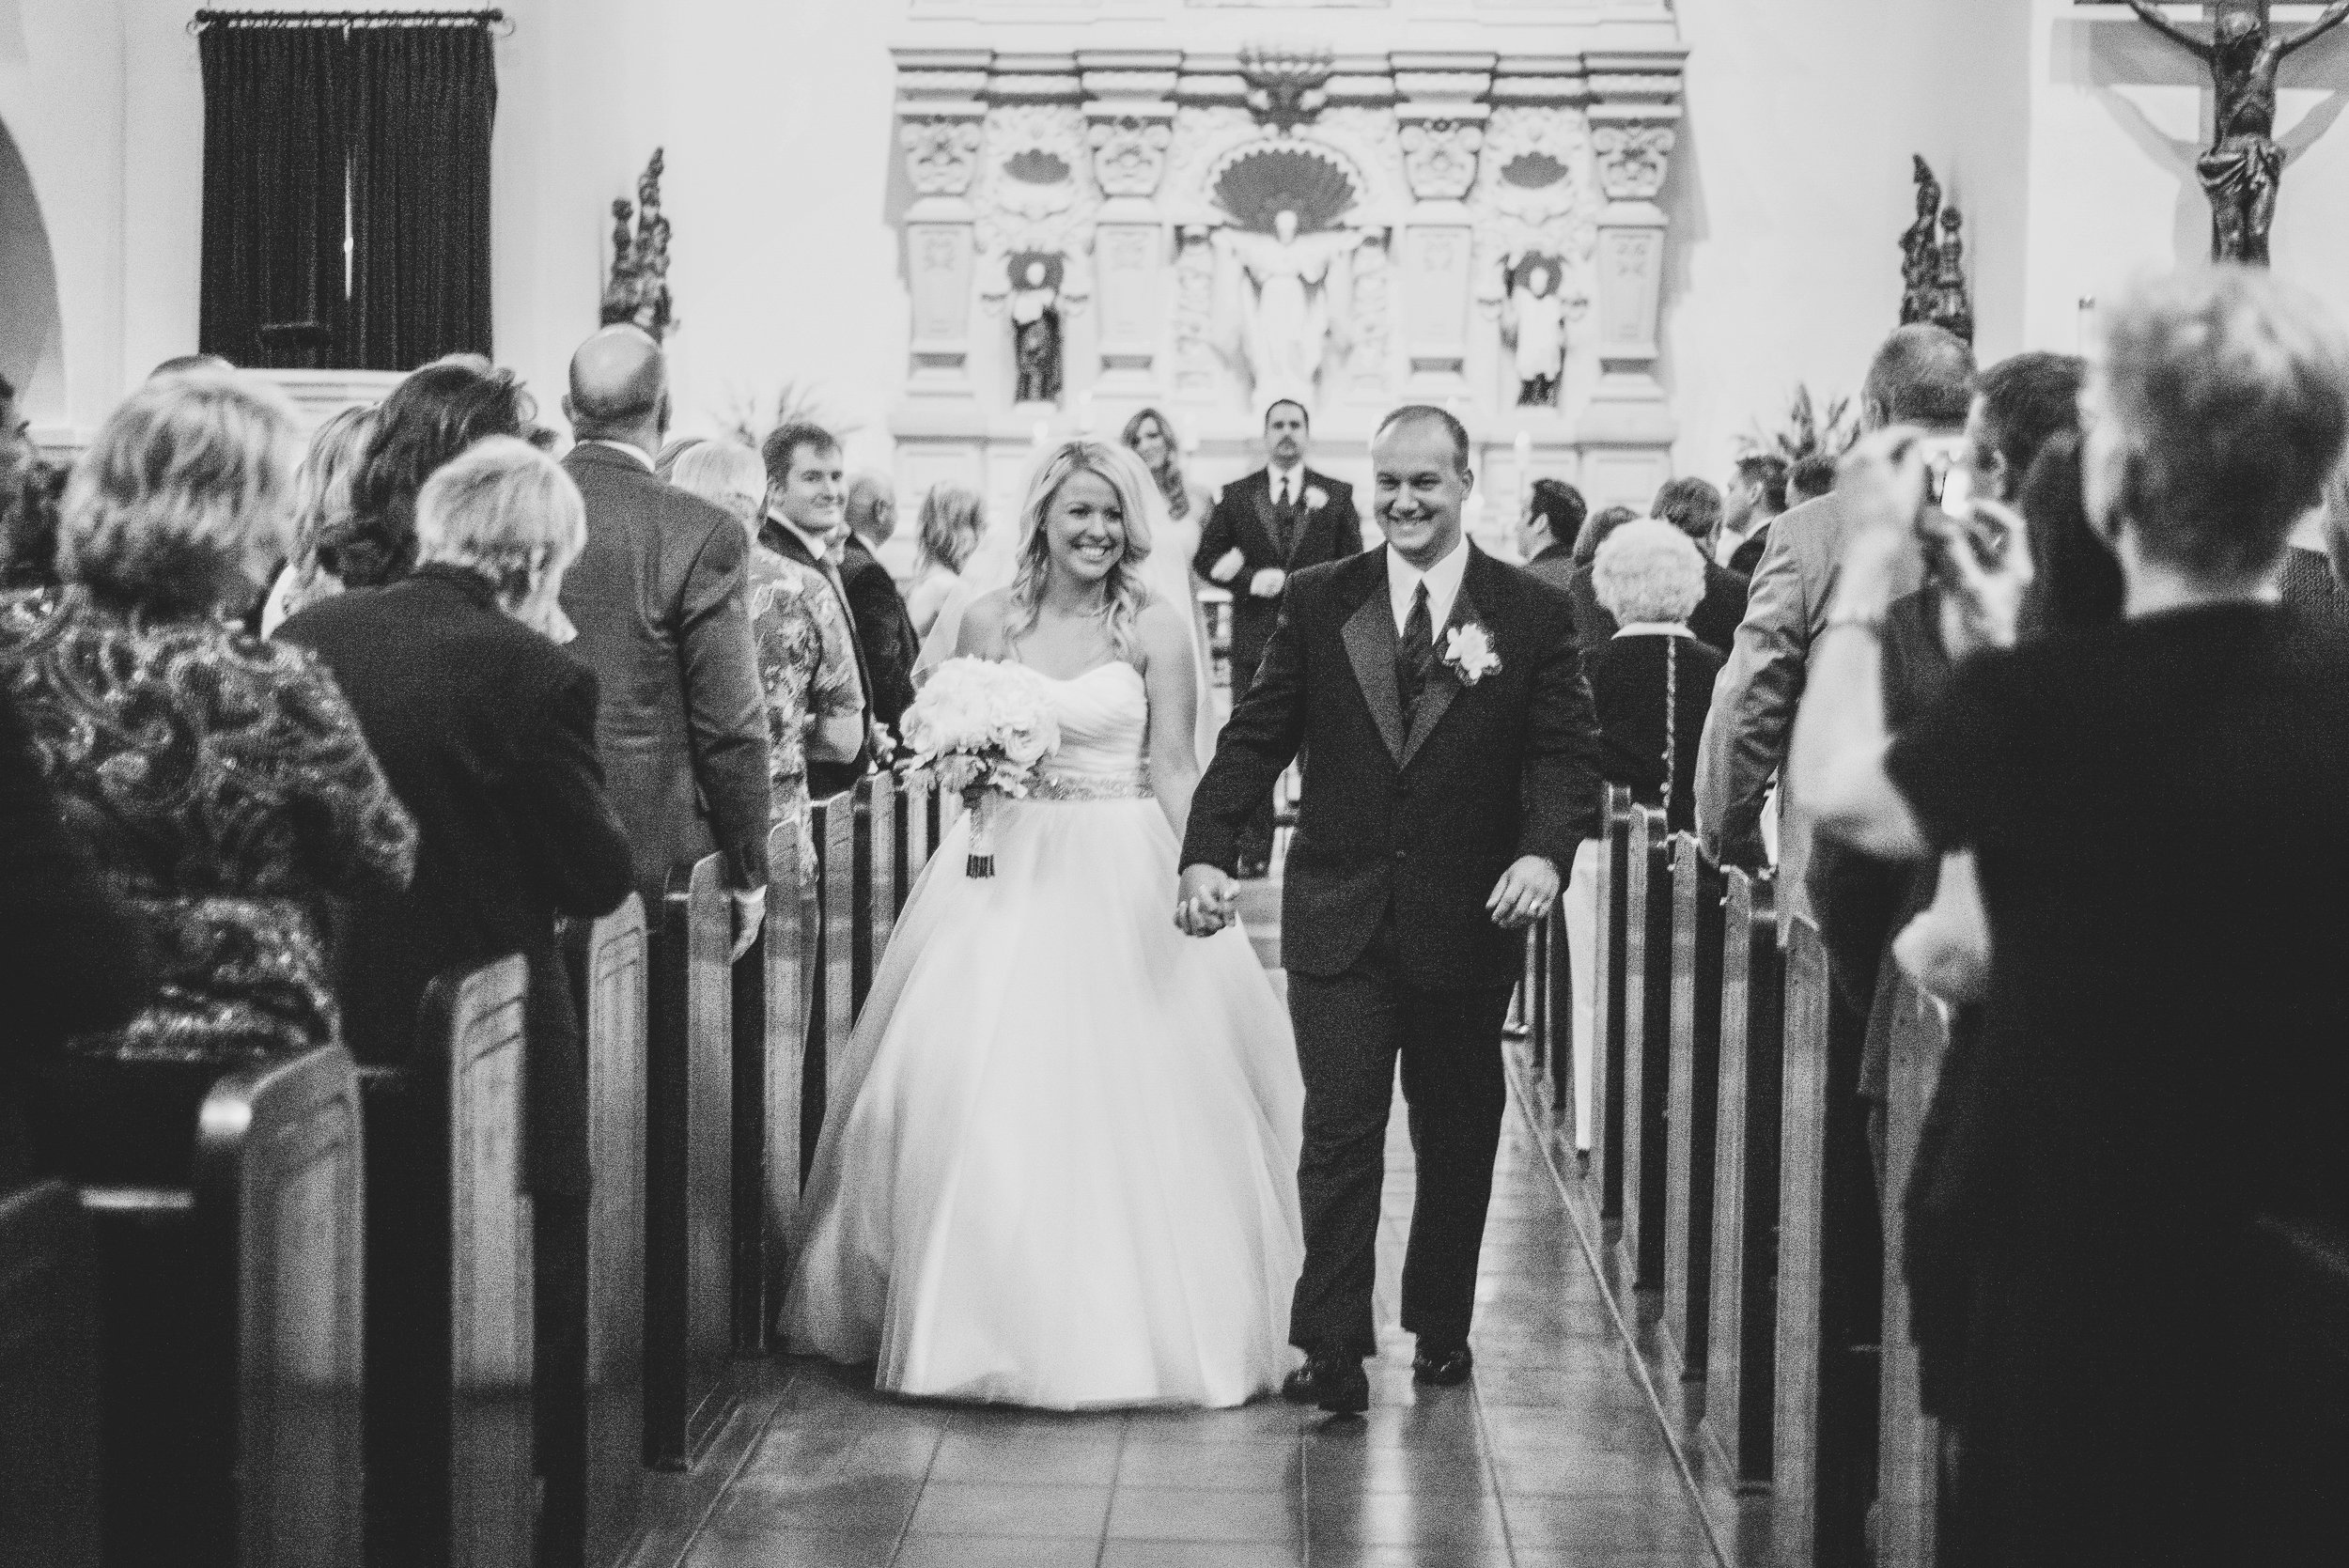 weddingwebsitesmallerpics-3.jpg